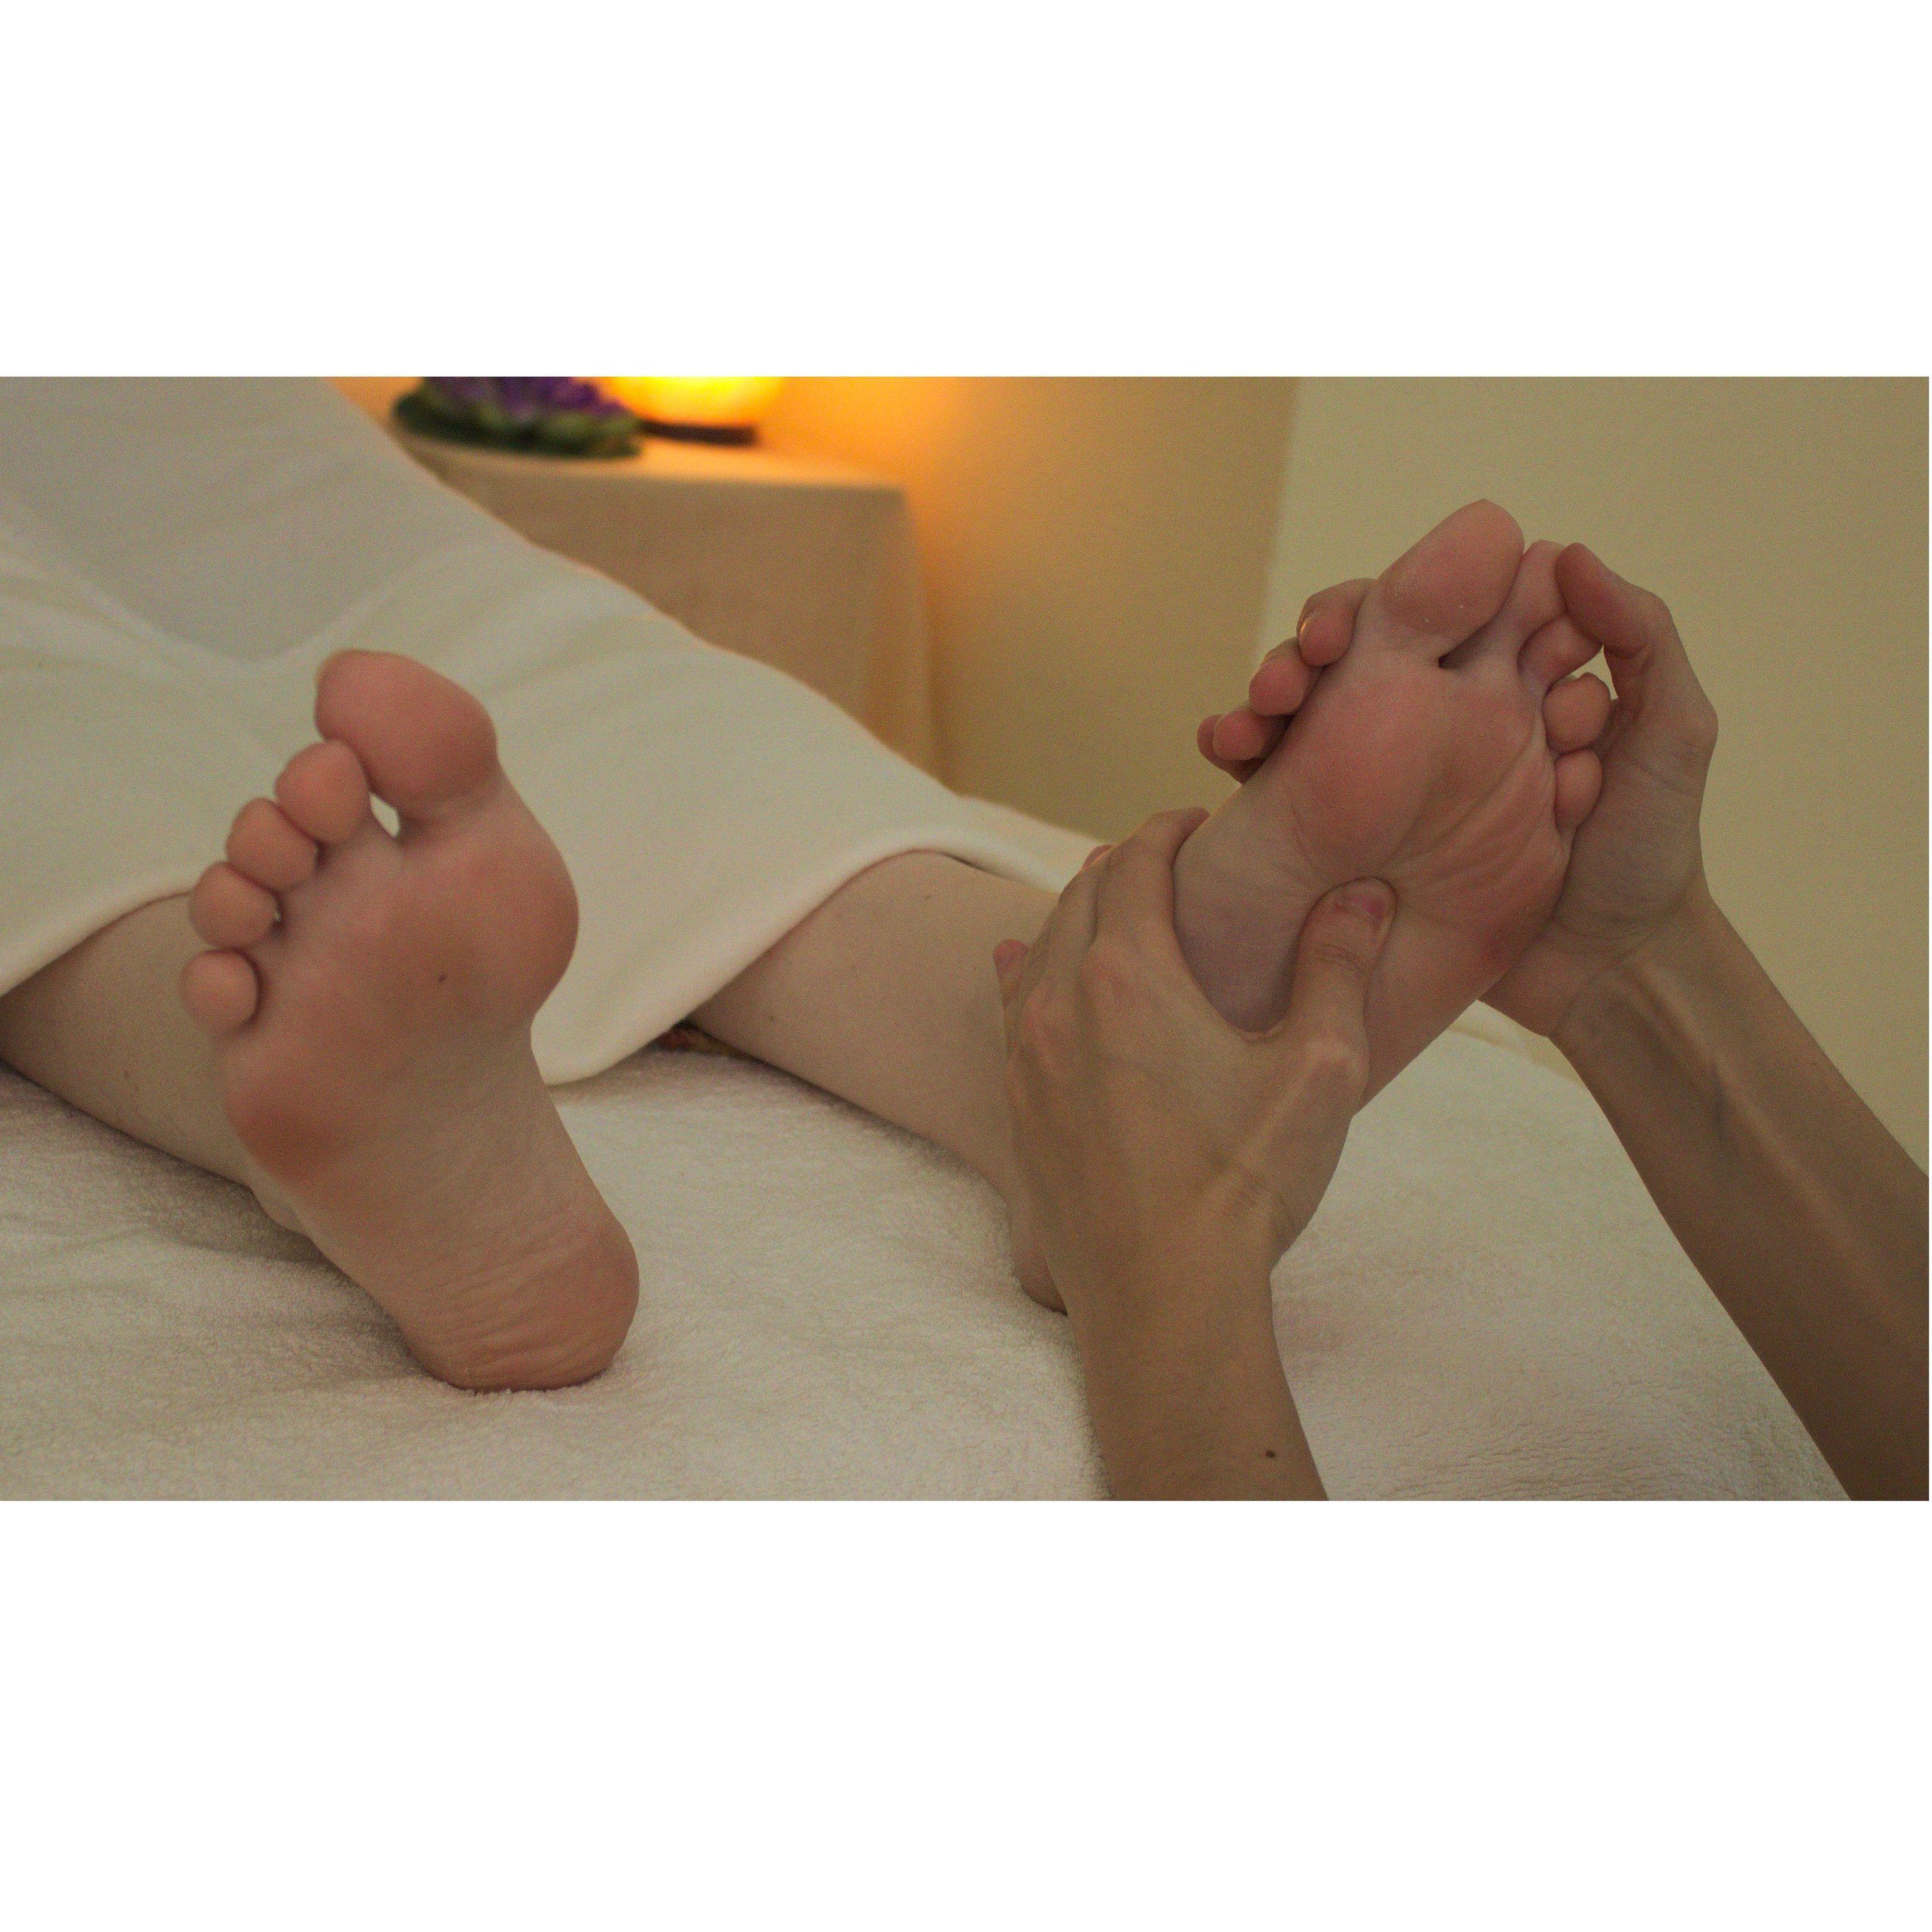 Reflexoterapia podal: Terapias de Yanara